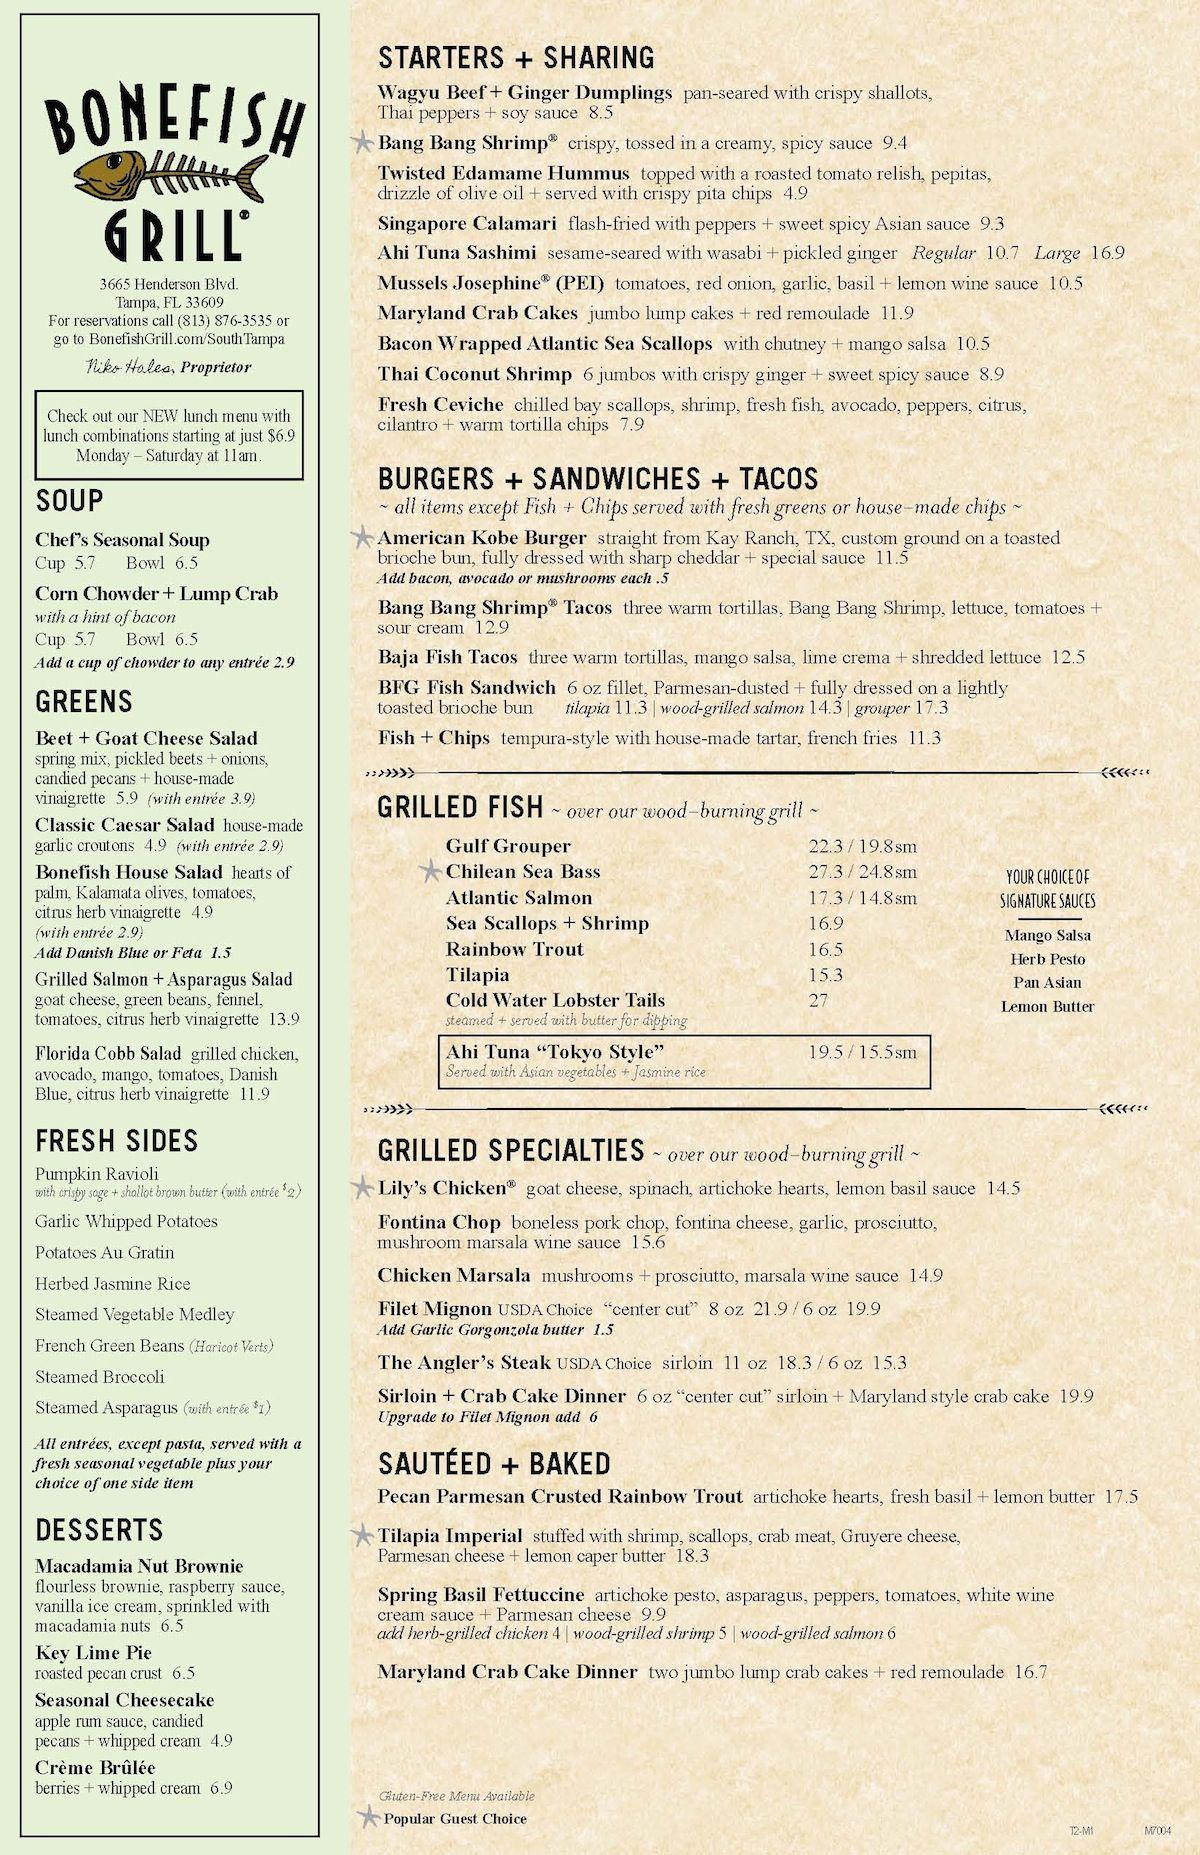 Bonefish Grill Us Wwwbonefishgrillcom Menus Restaurant